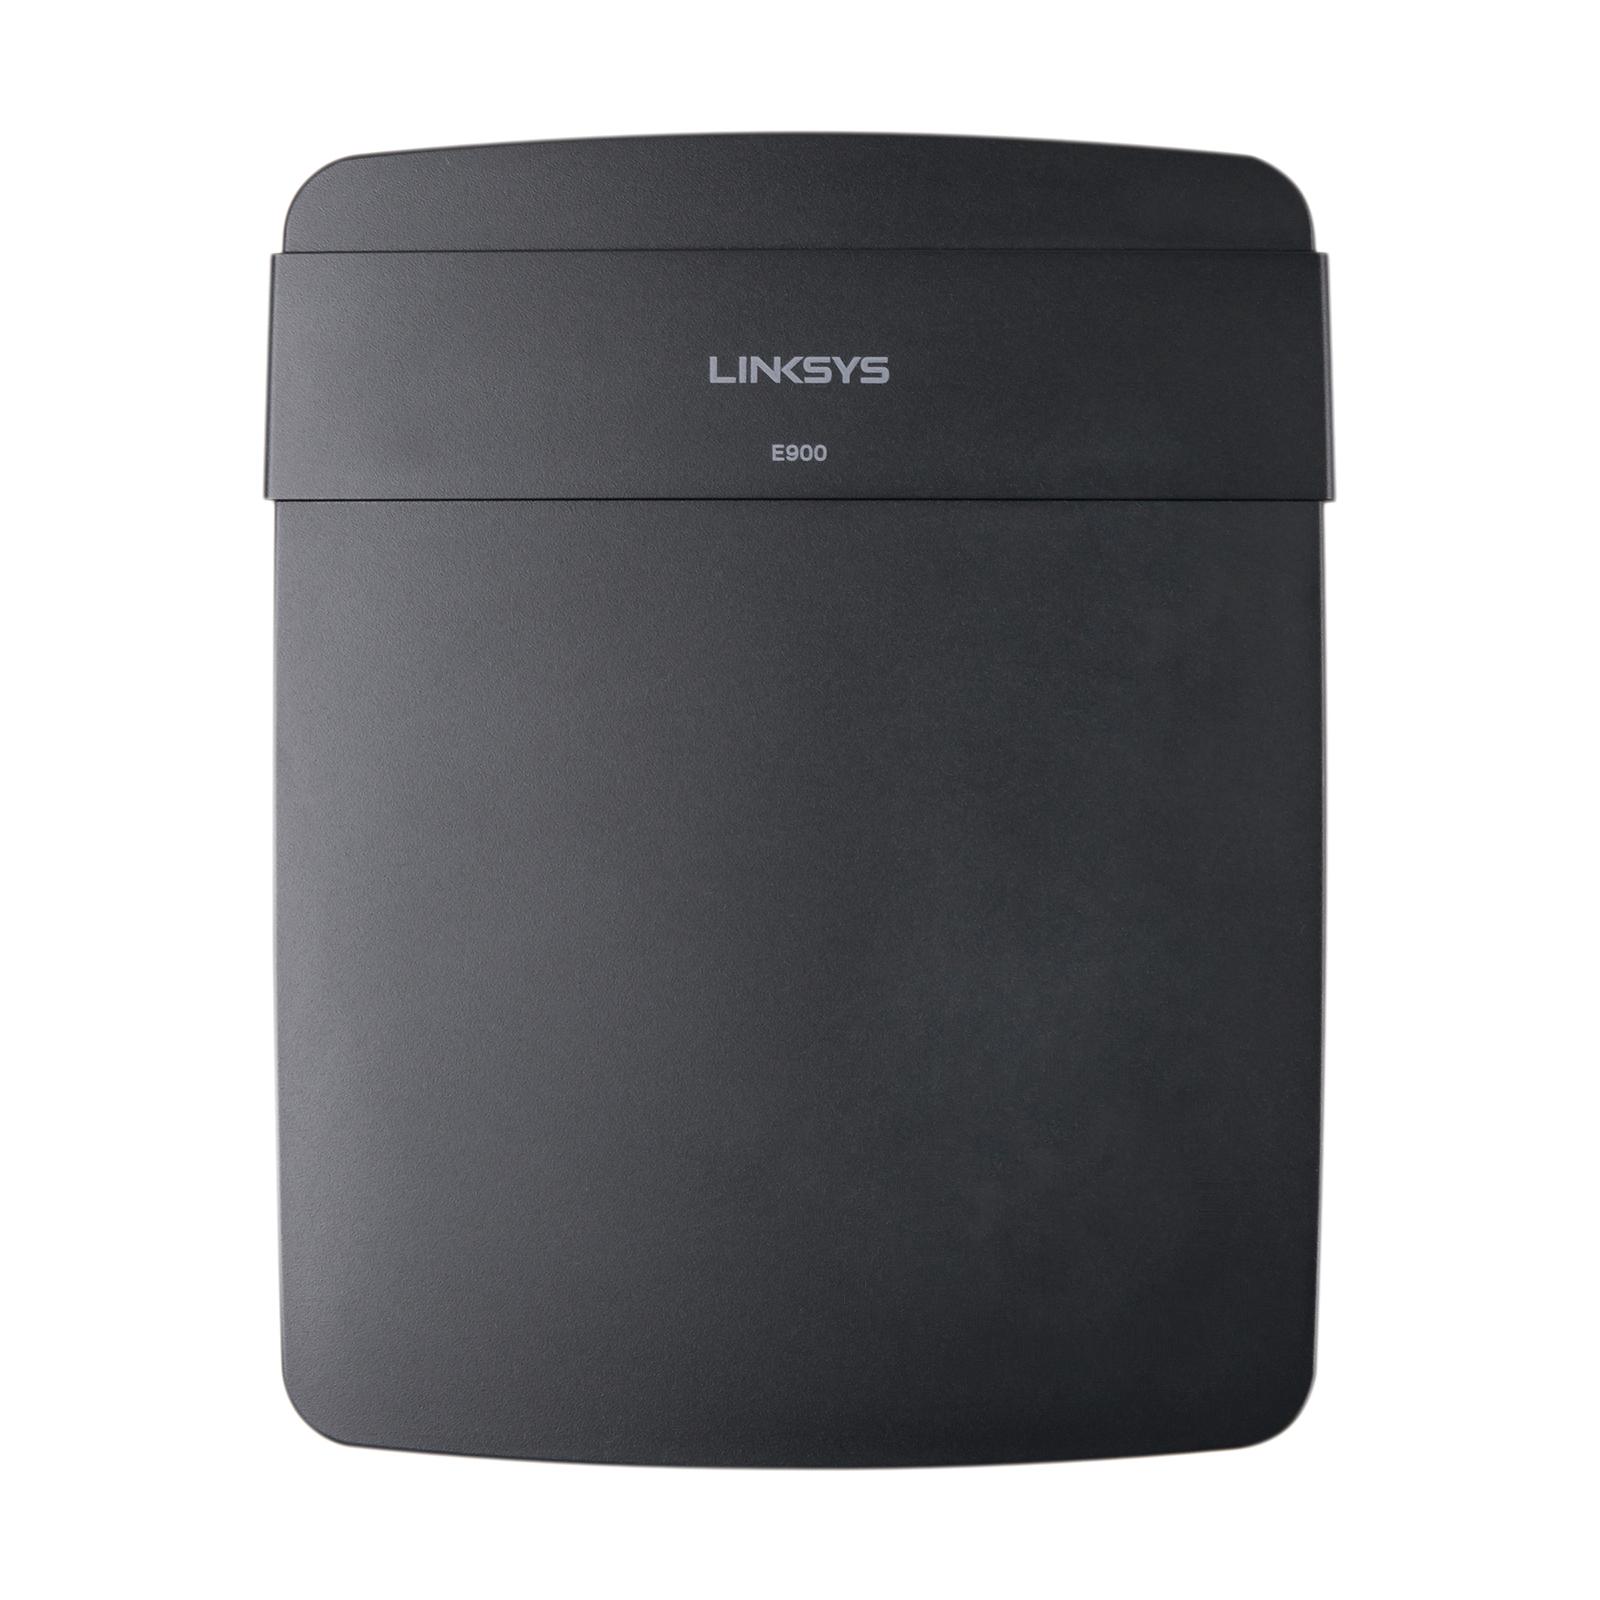 Маршрутизатор LinkSys E900 изображение 2